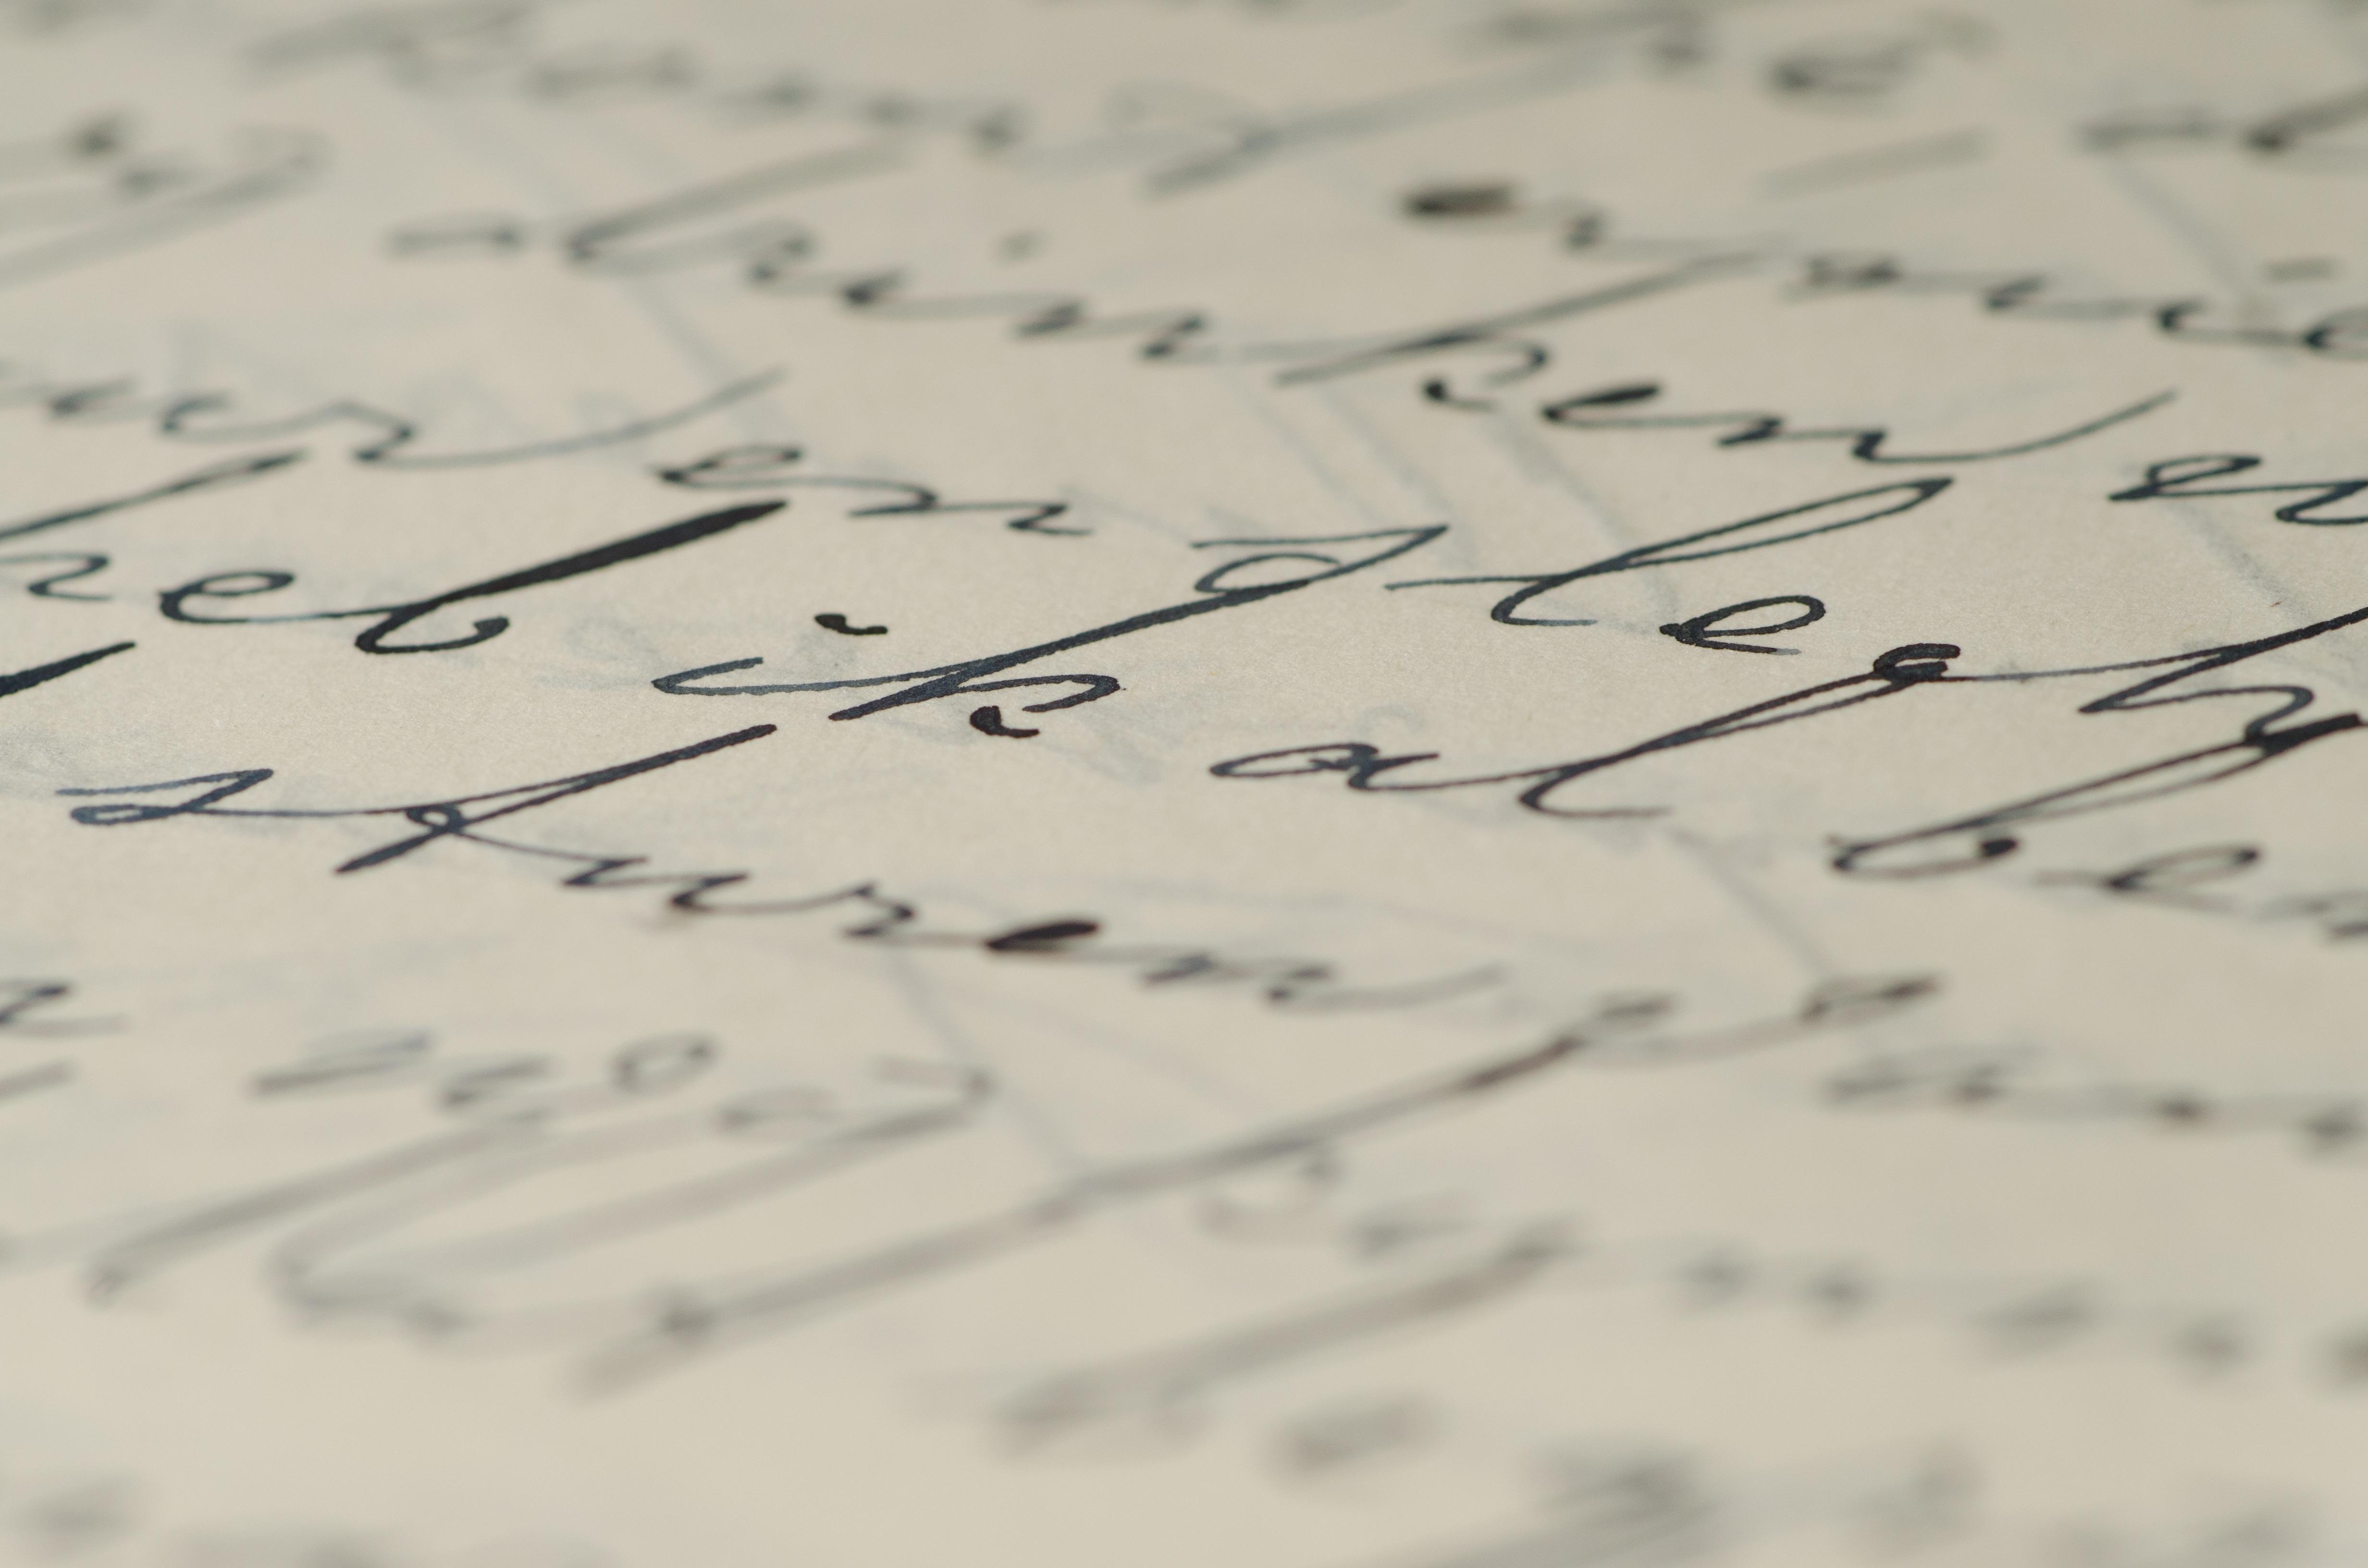 handwriting on paper